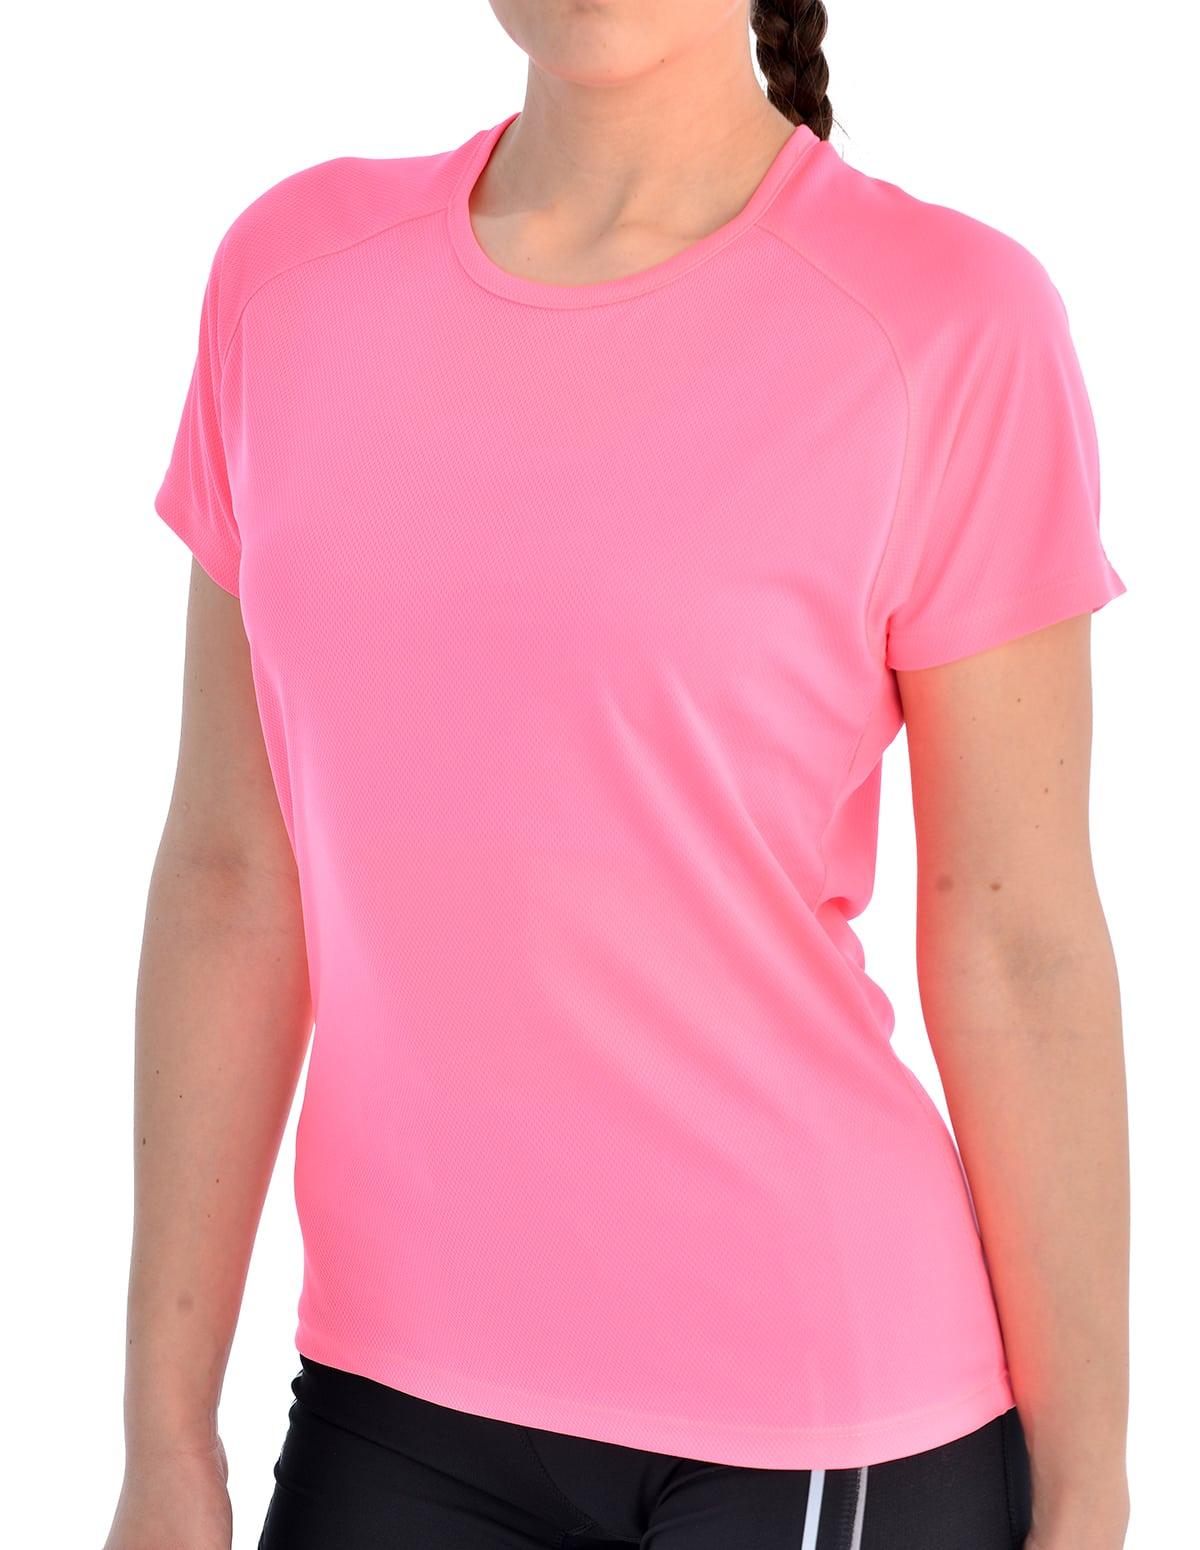 8e06116986d Γυναικείο αθλητικό dry fit μπλουζάκι σε φούξια χρώμα